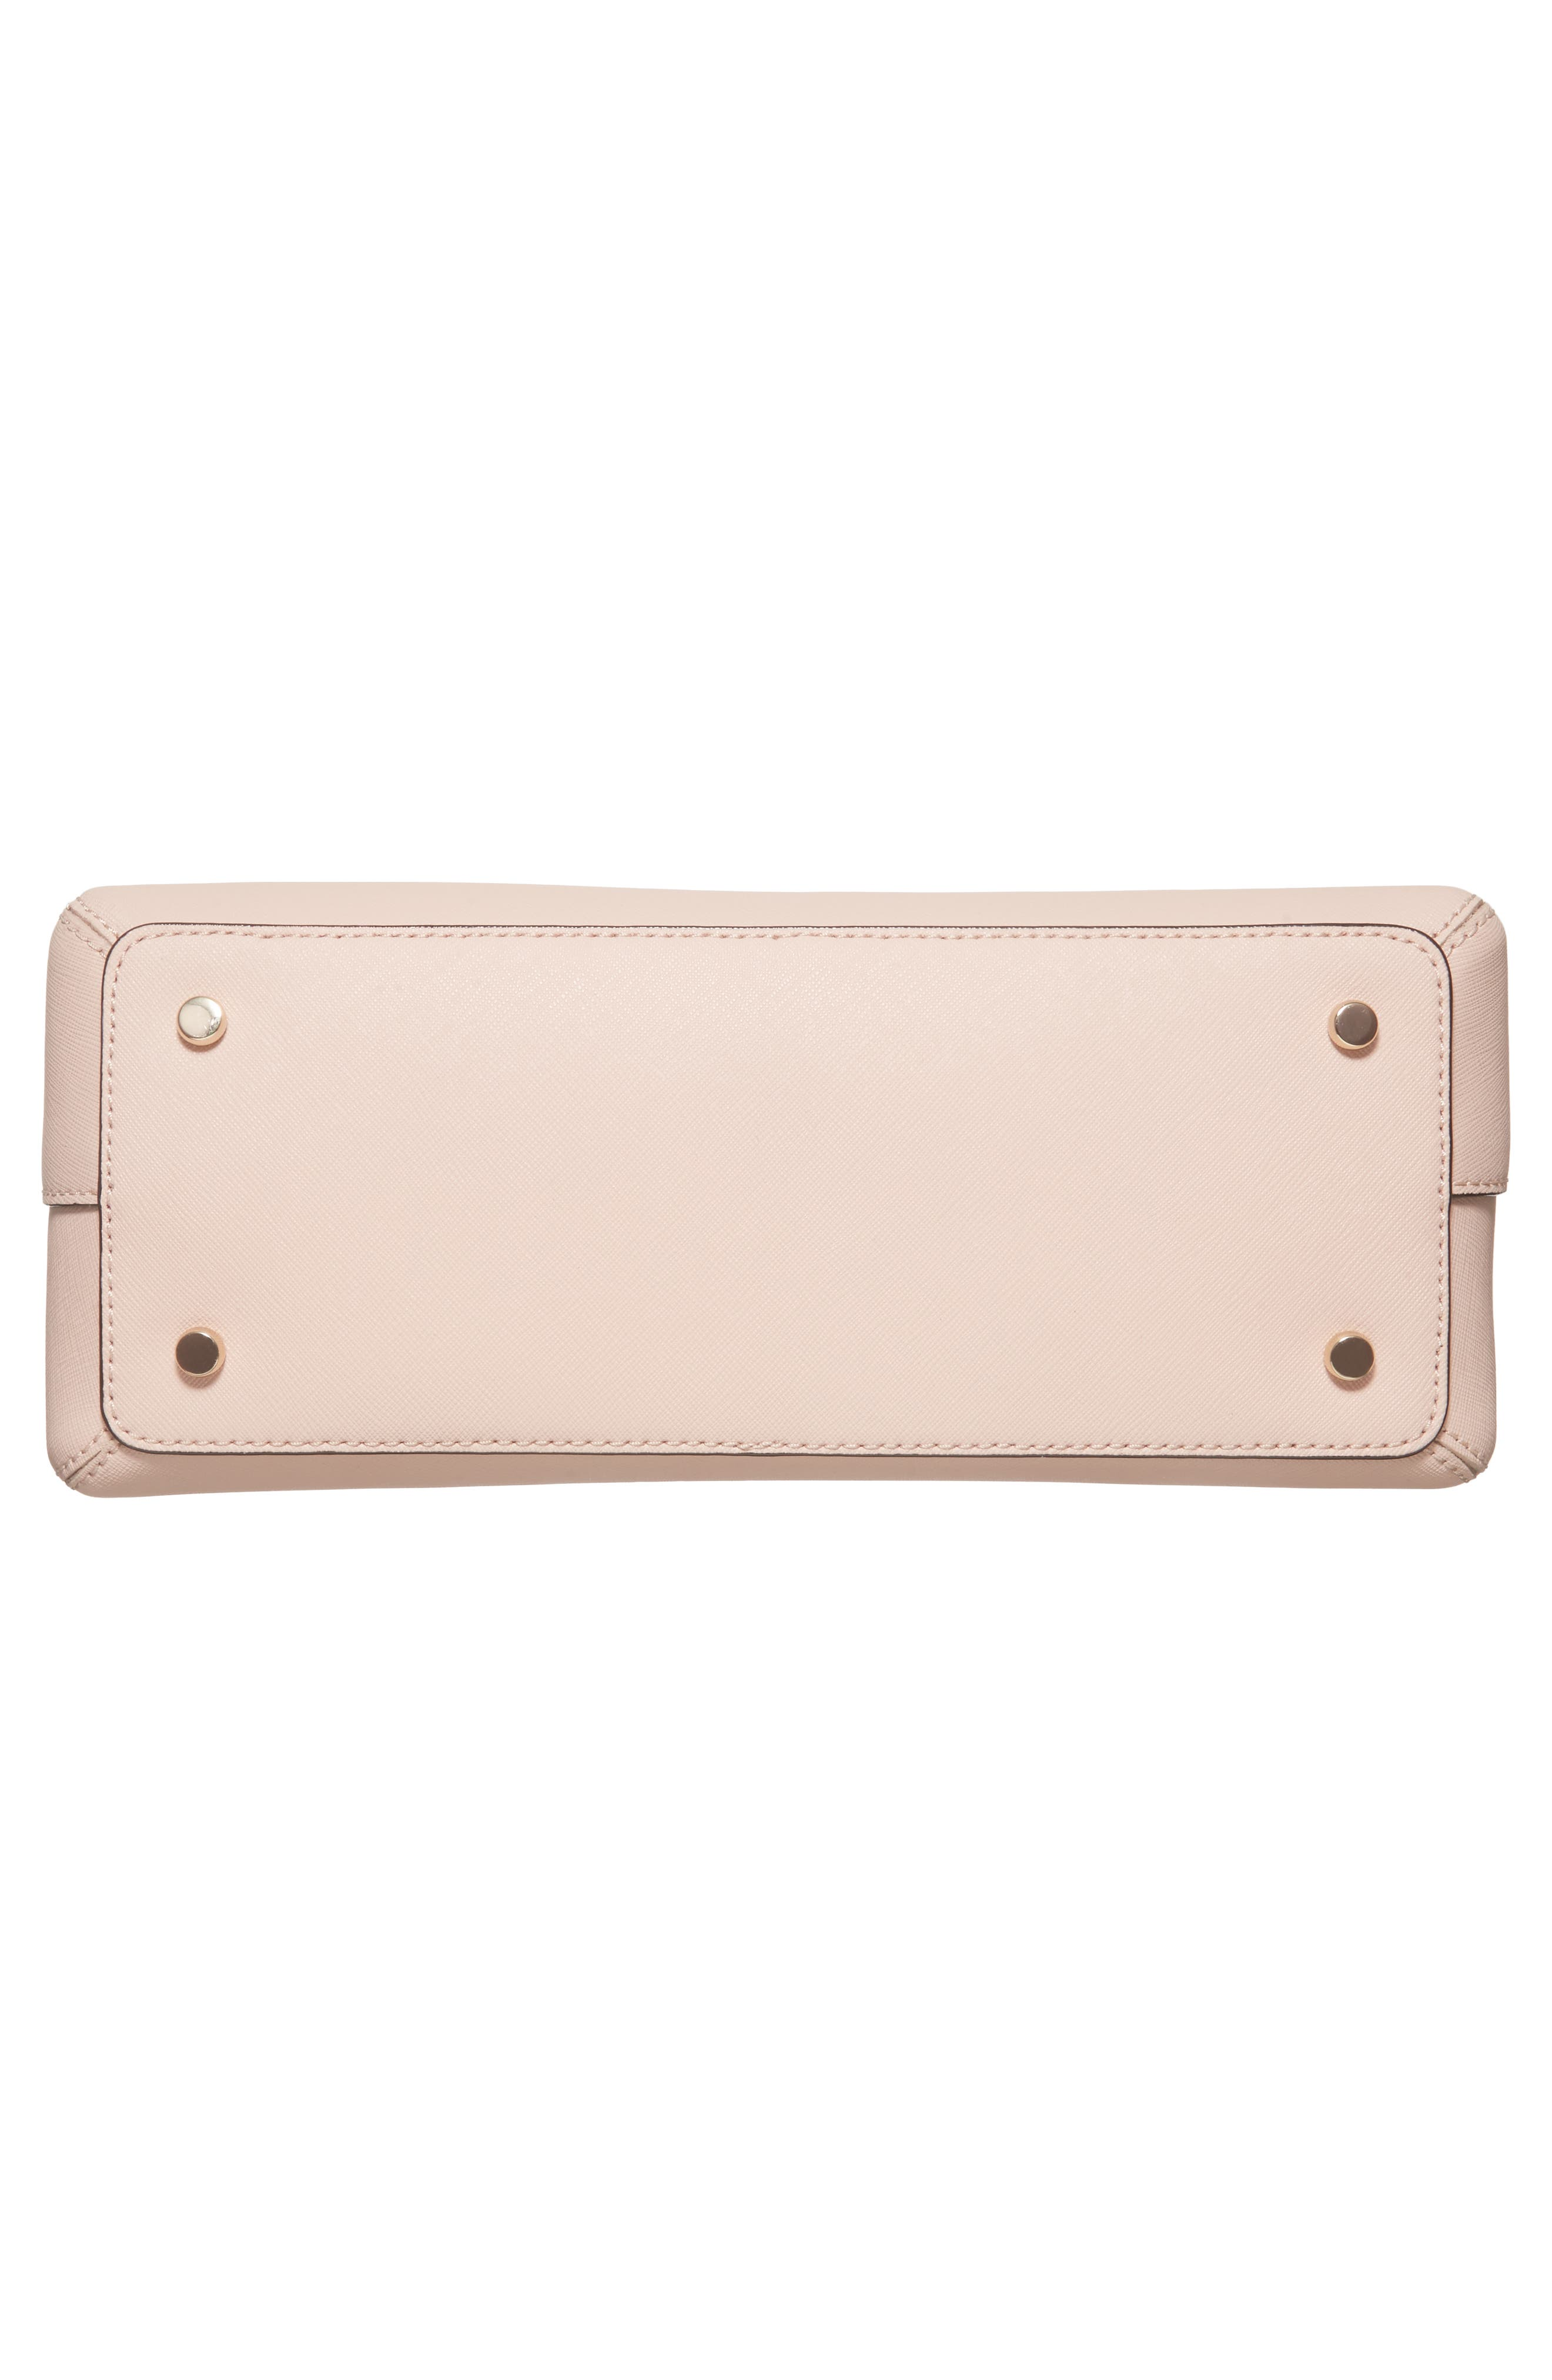 cameron street maise leather satchel,                             Alternate thumbnail 5, color,                             Warm Vellum